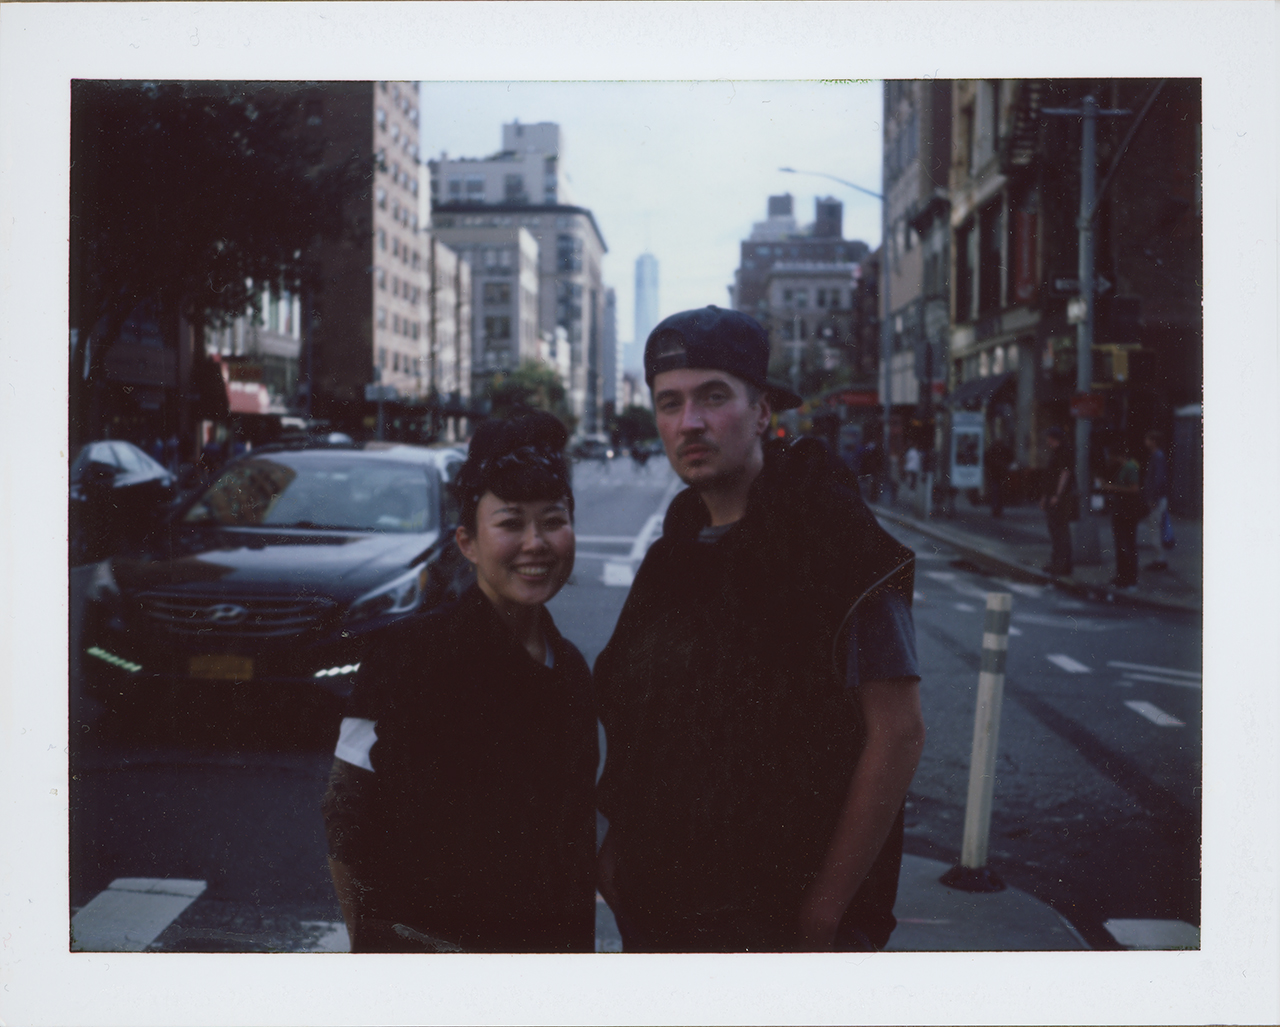 Yoko and Jayson on FP-100c